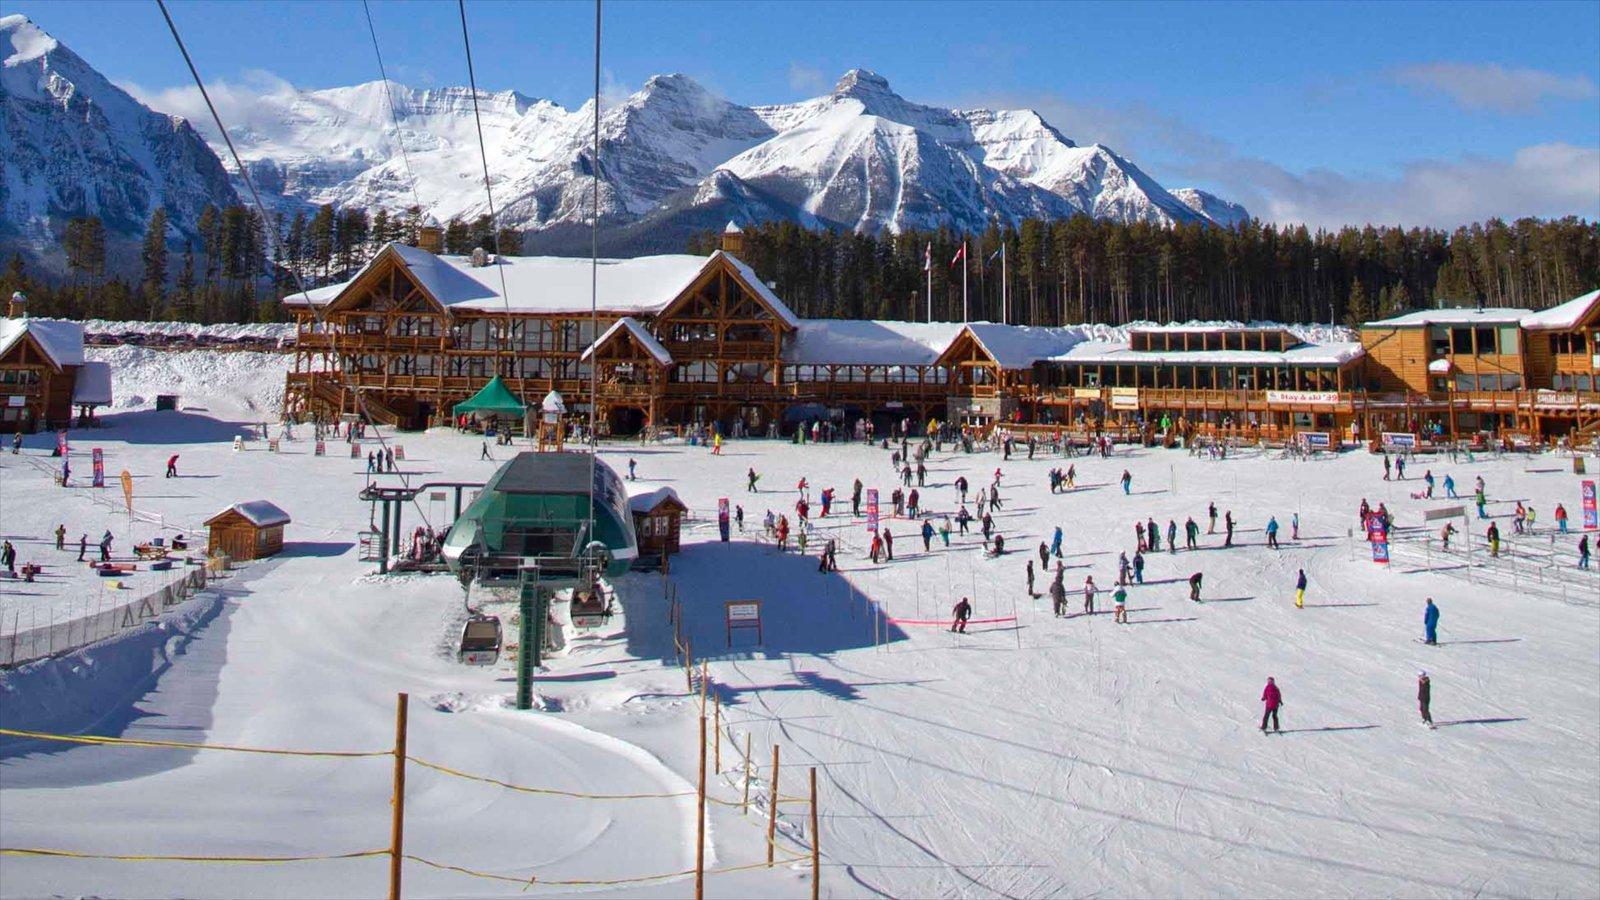 Lake Louise Mountain Resort showing snow skiing and snow